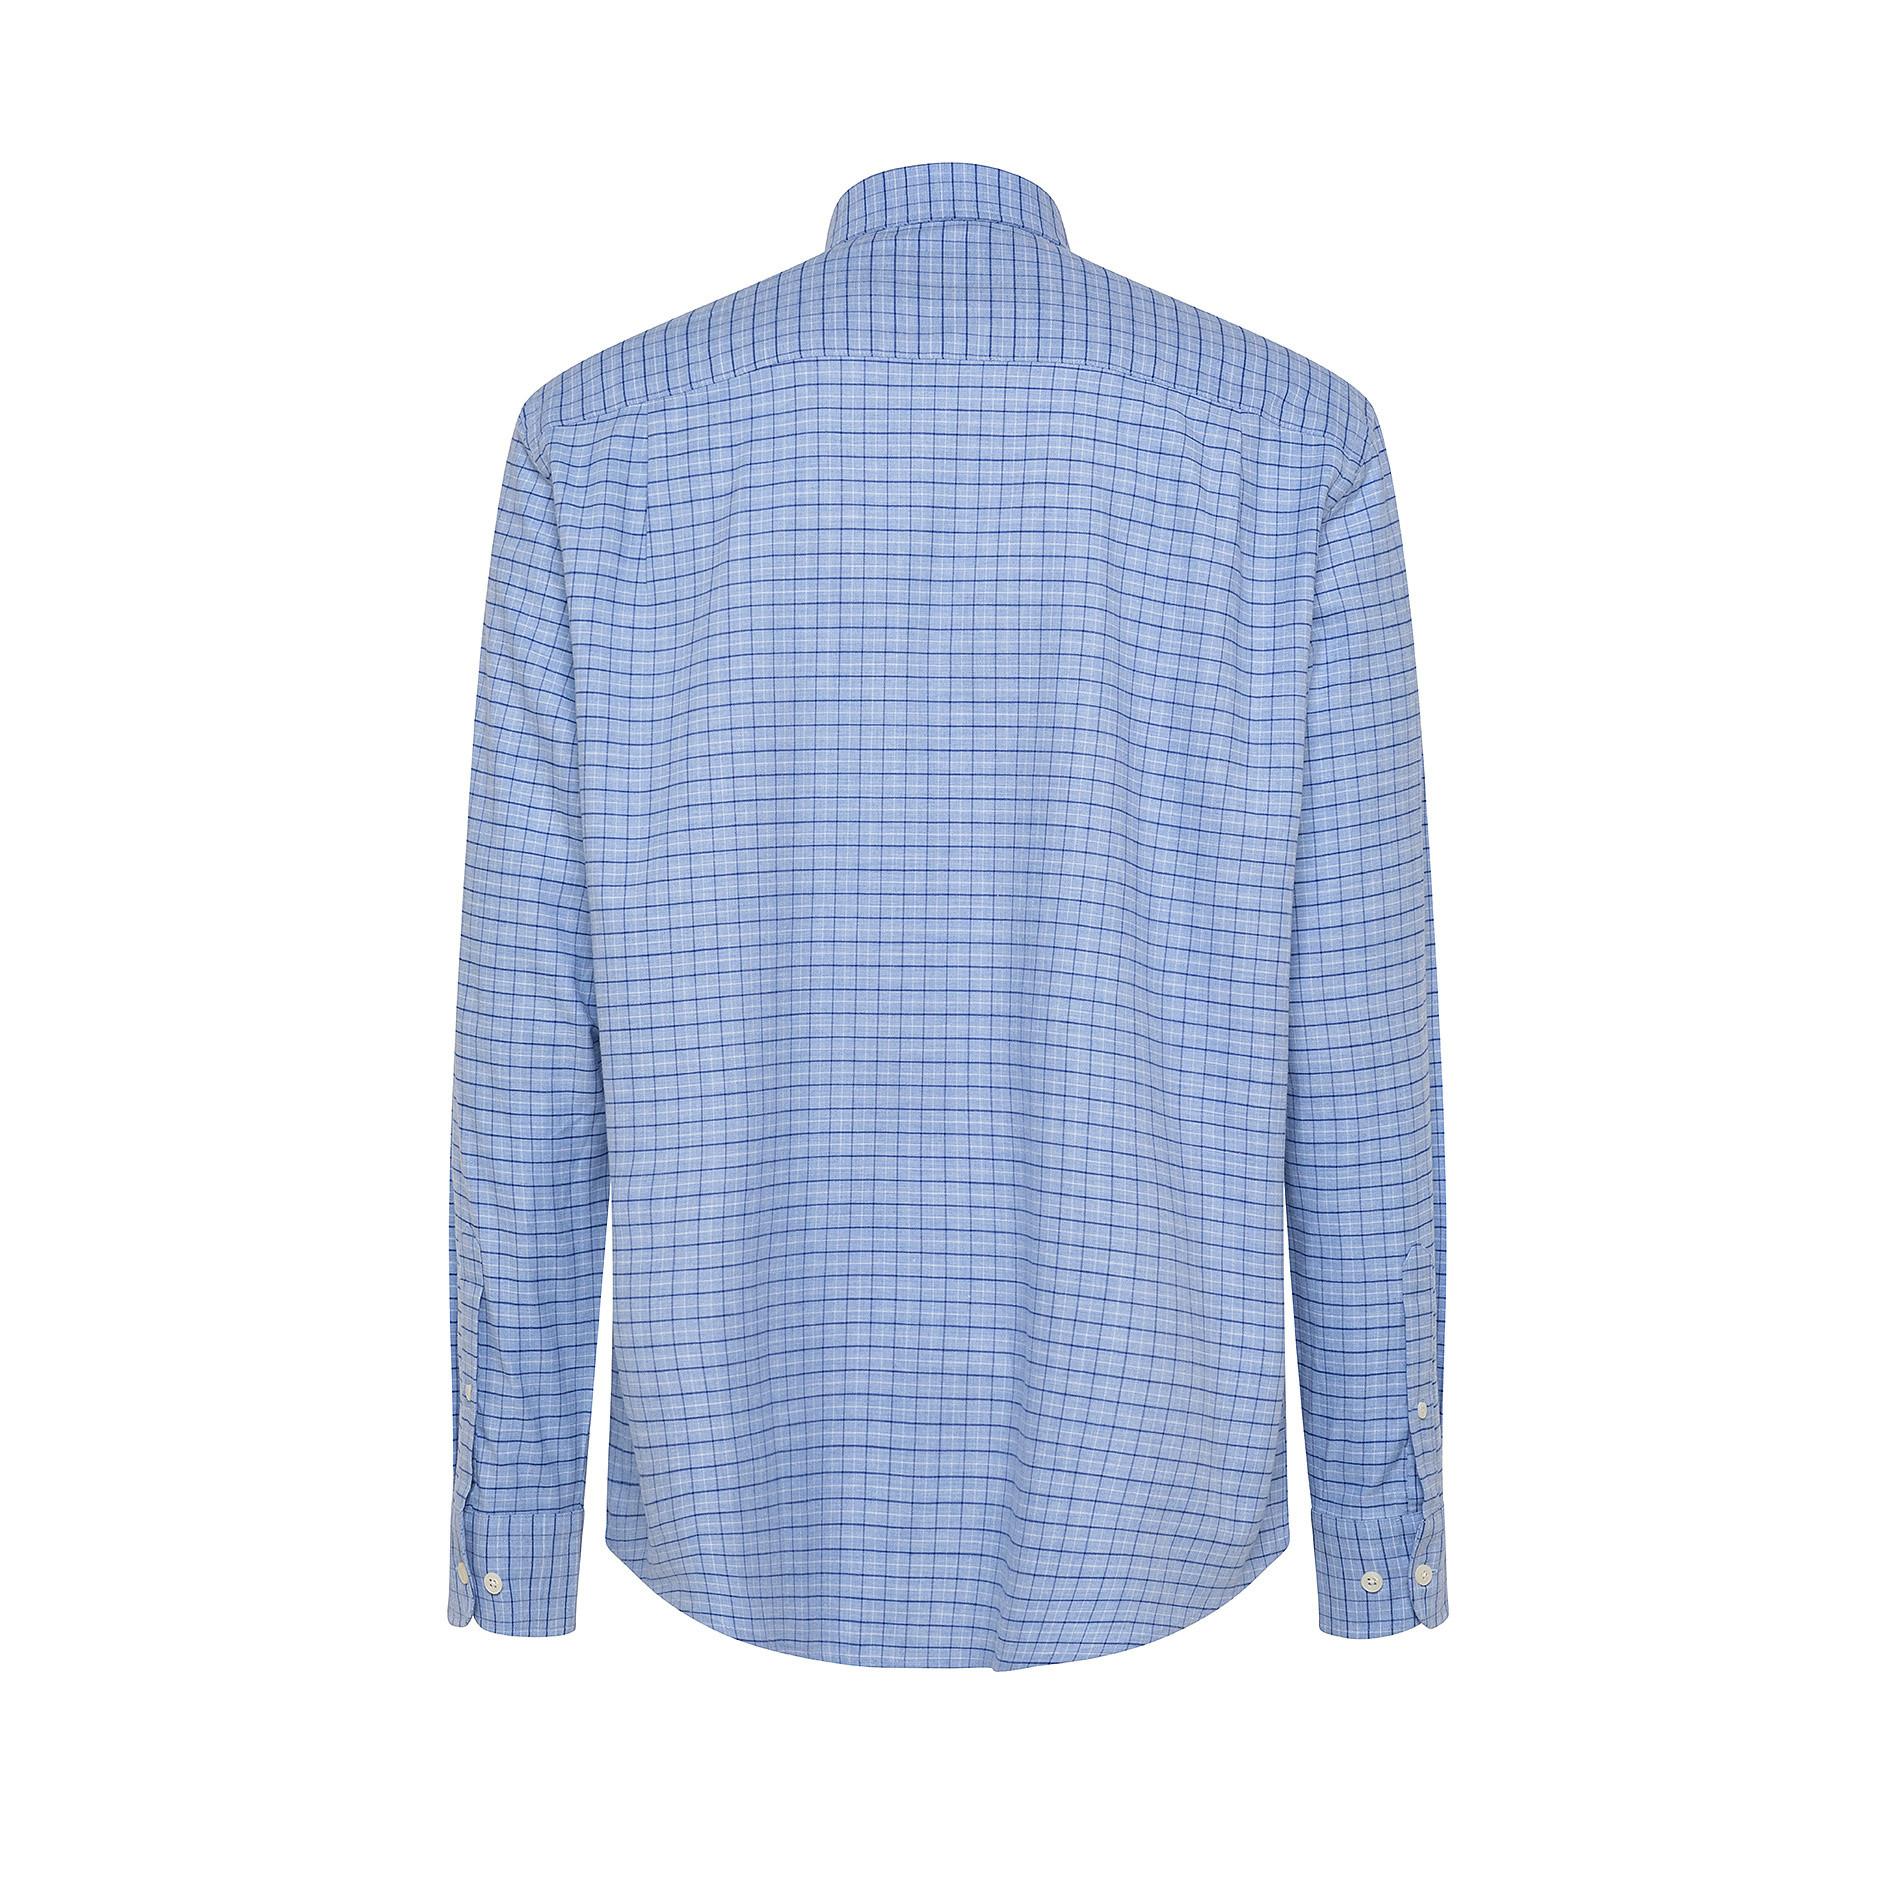 Camicia button-down regular fit in cotone organico, Azzurro, large image number 1